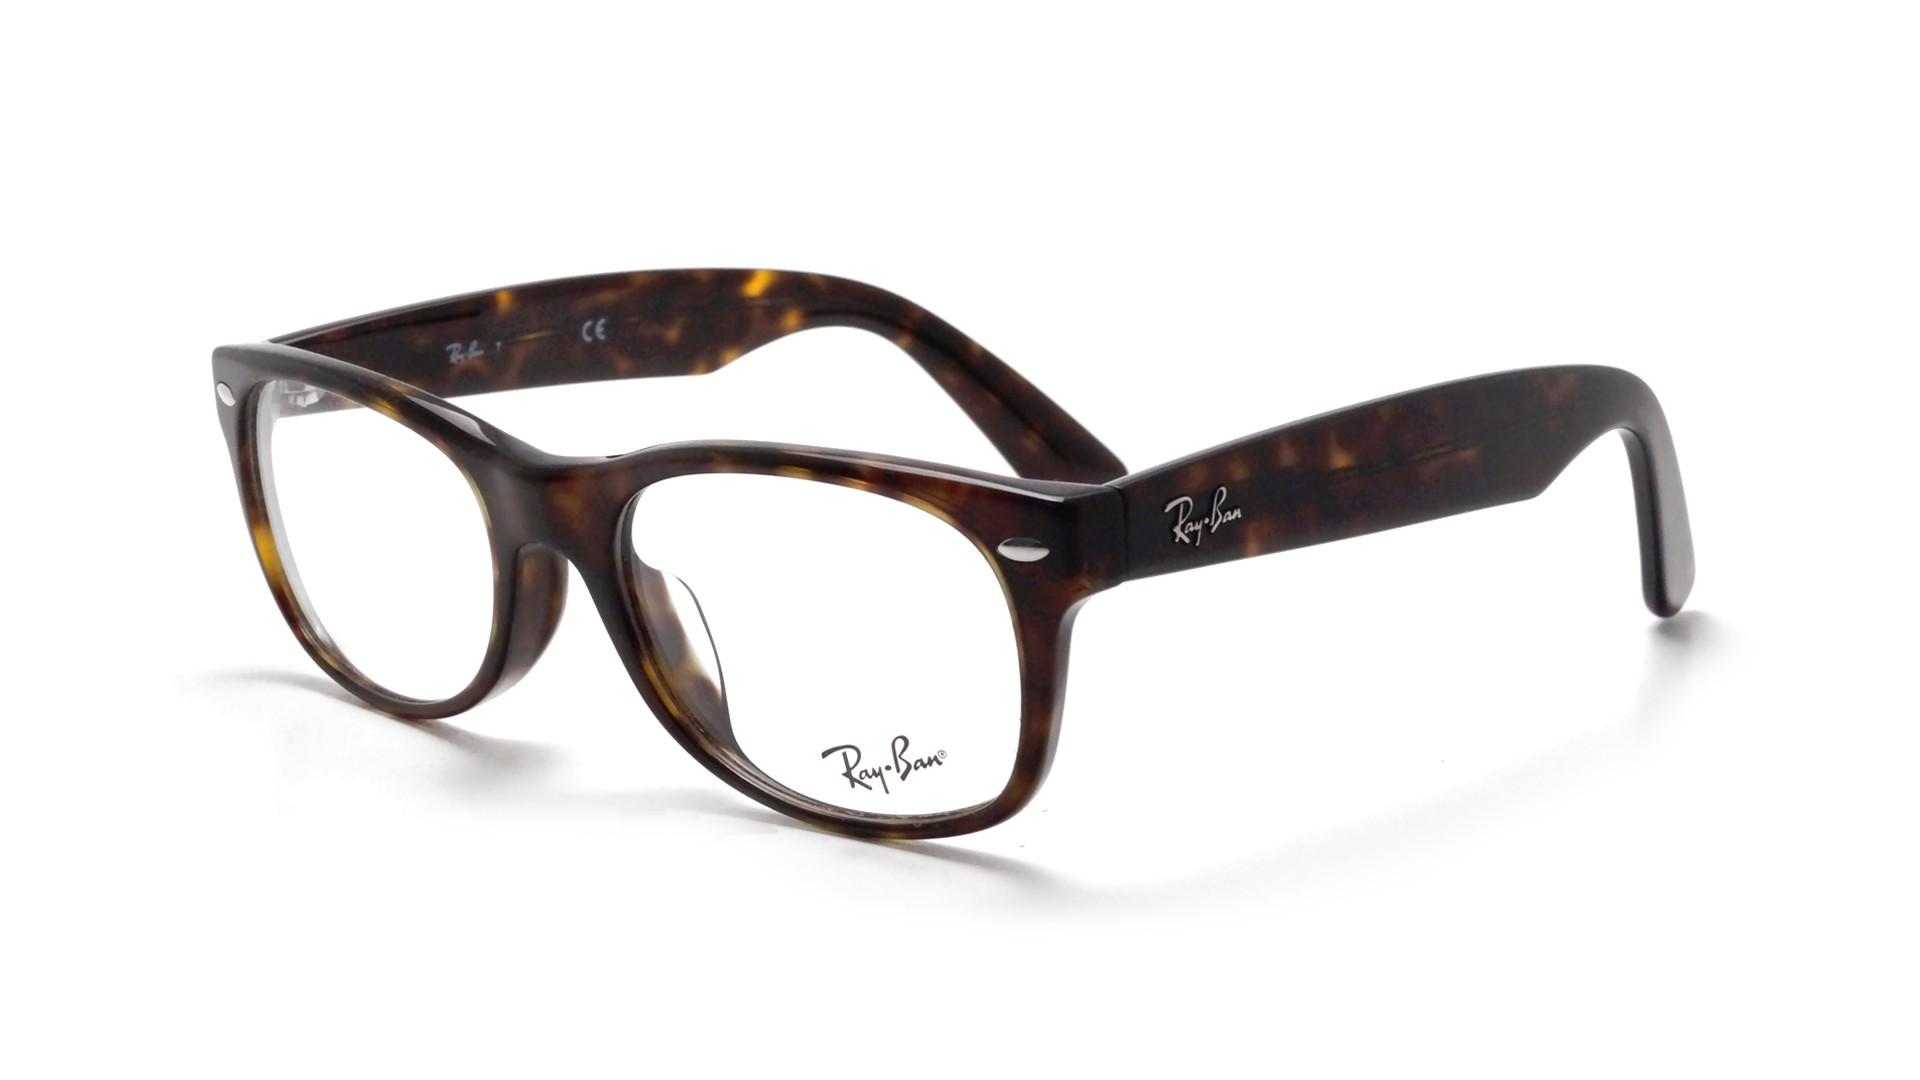 e512f767ce01db Eyeglasses Ray-Ban New Wayfarer Asian Fit Tortoise RX5184 RB5184F 2012  52-18 Medium